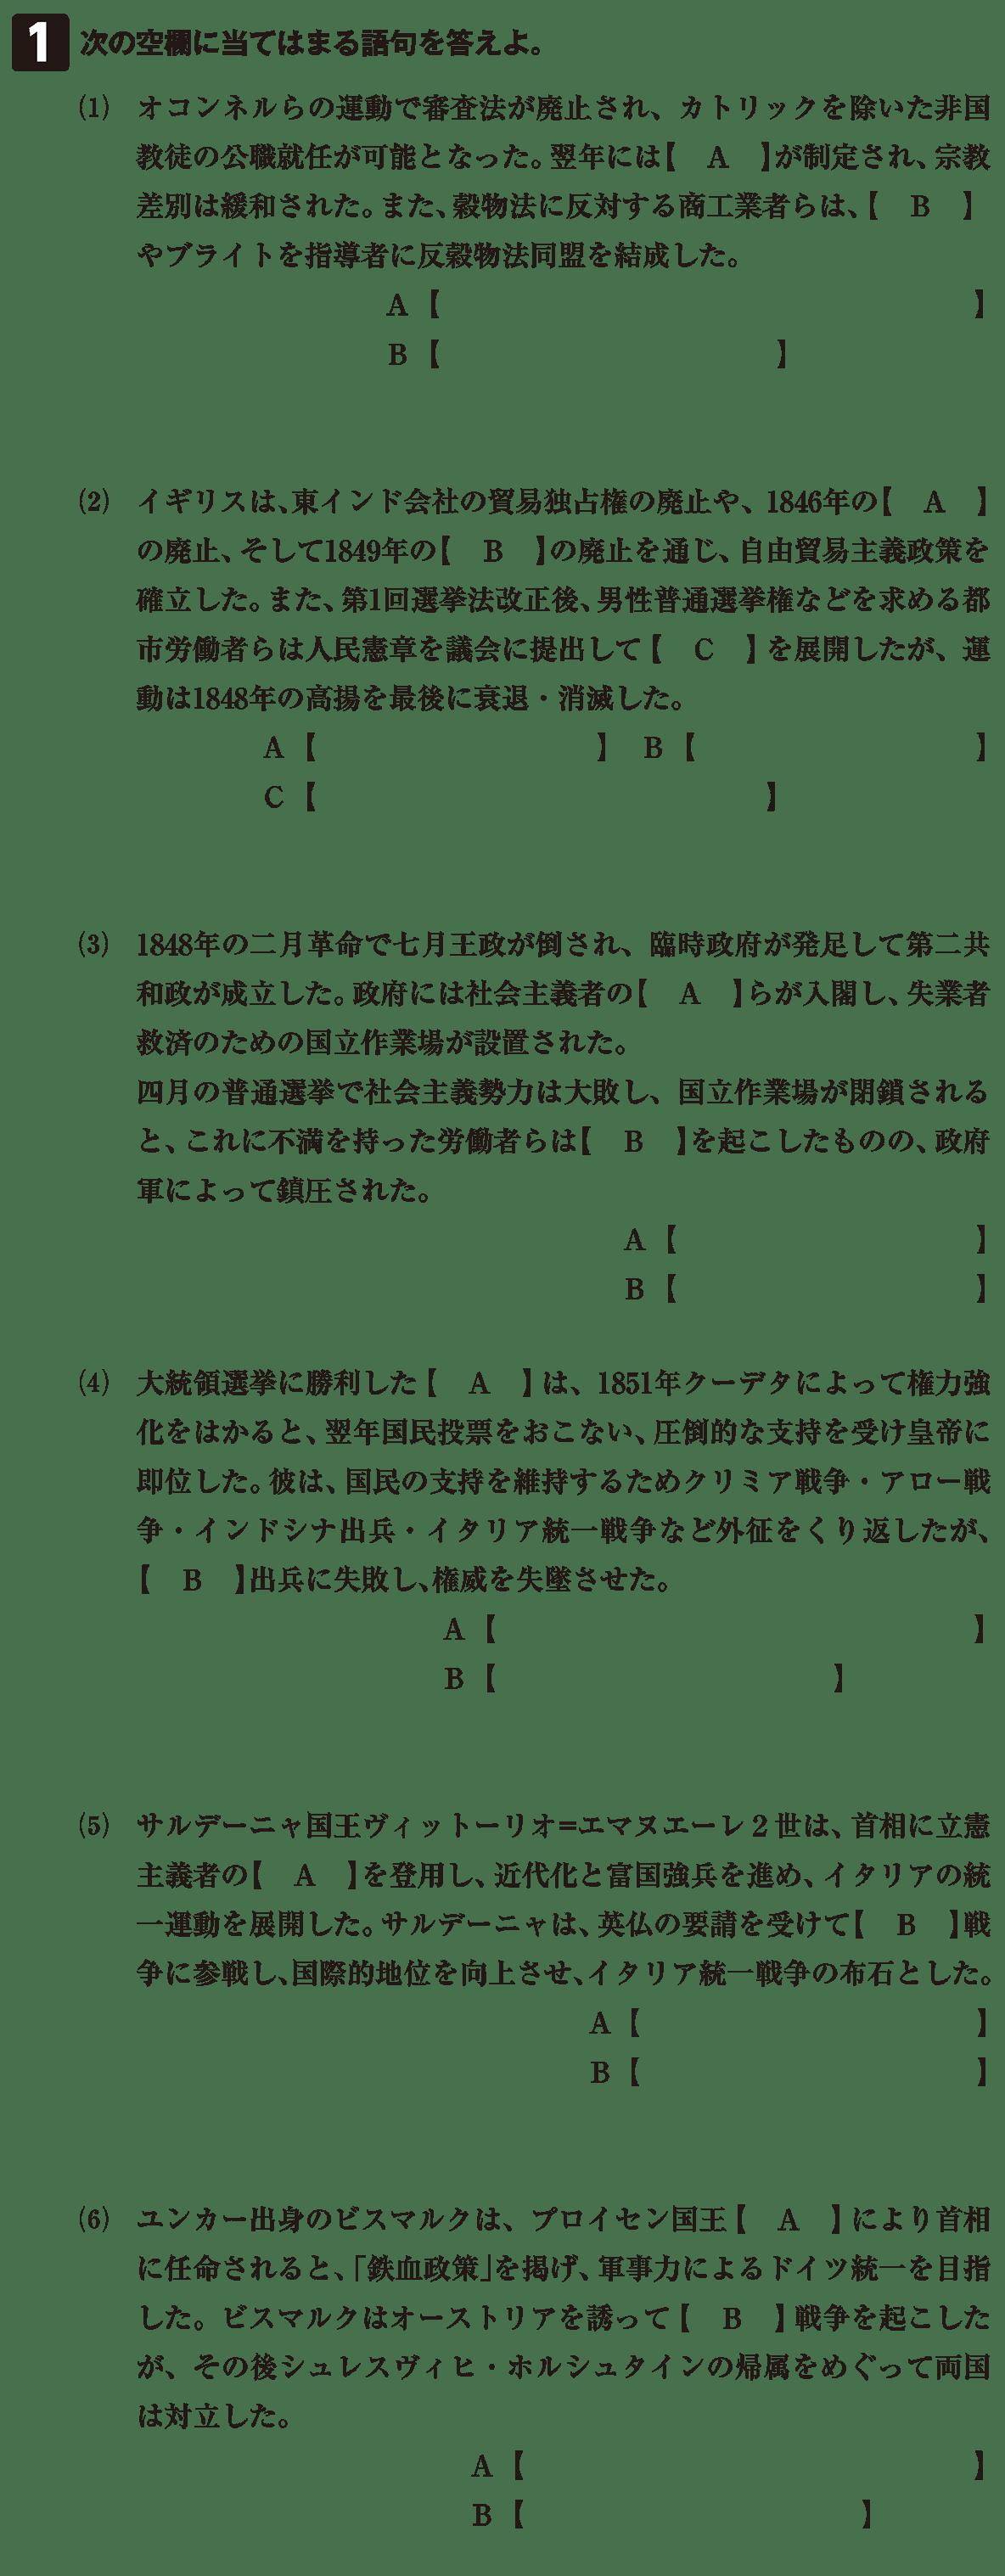 19世紀の欧米諸国(1)英・仏・伊・独8 確認テスト(前半)